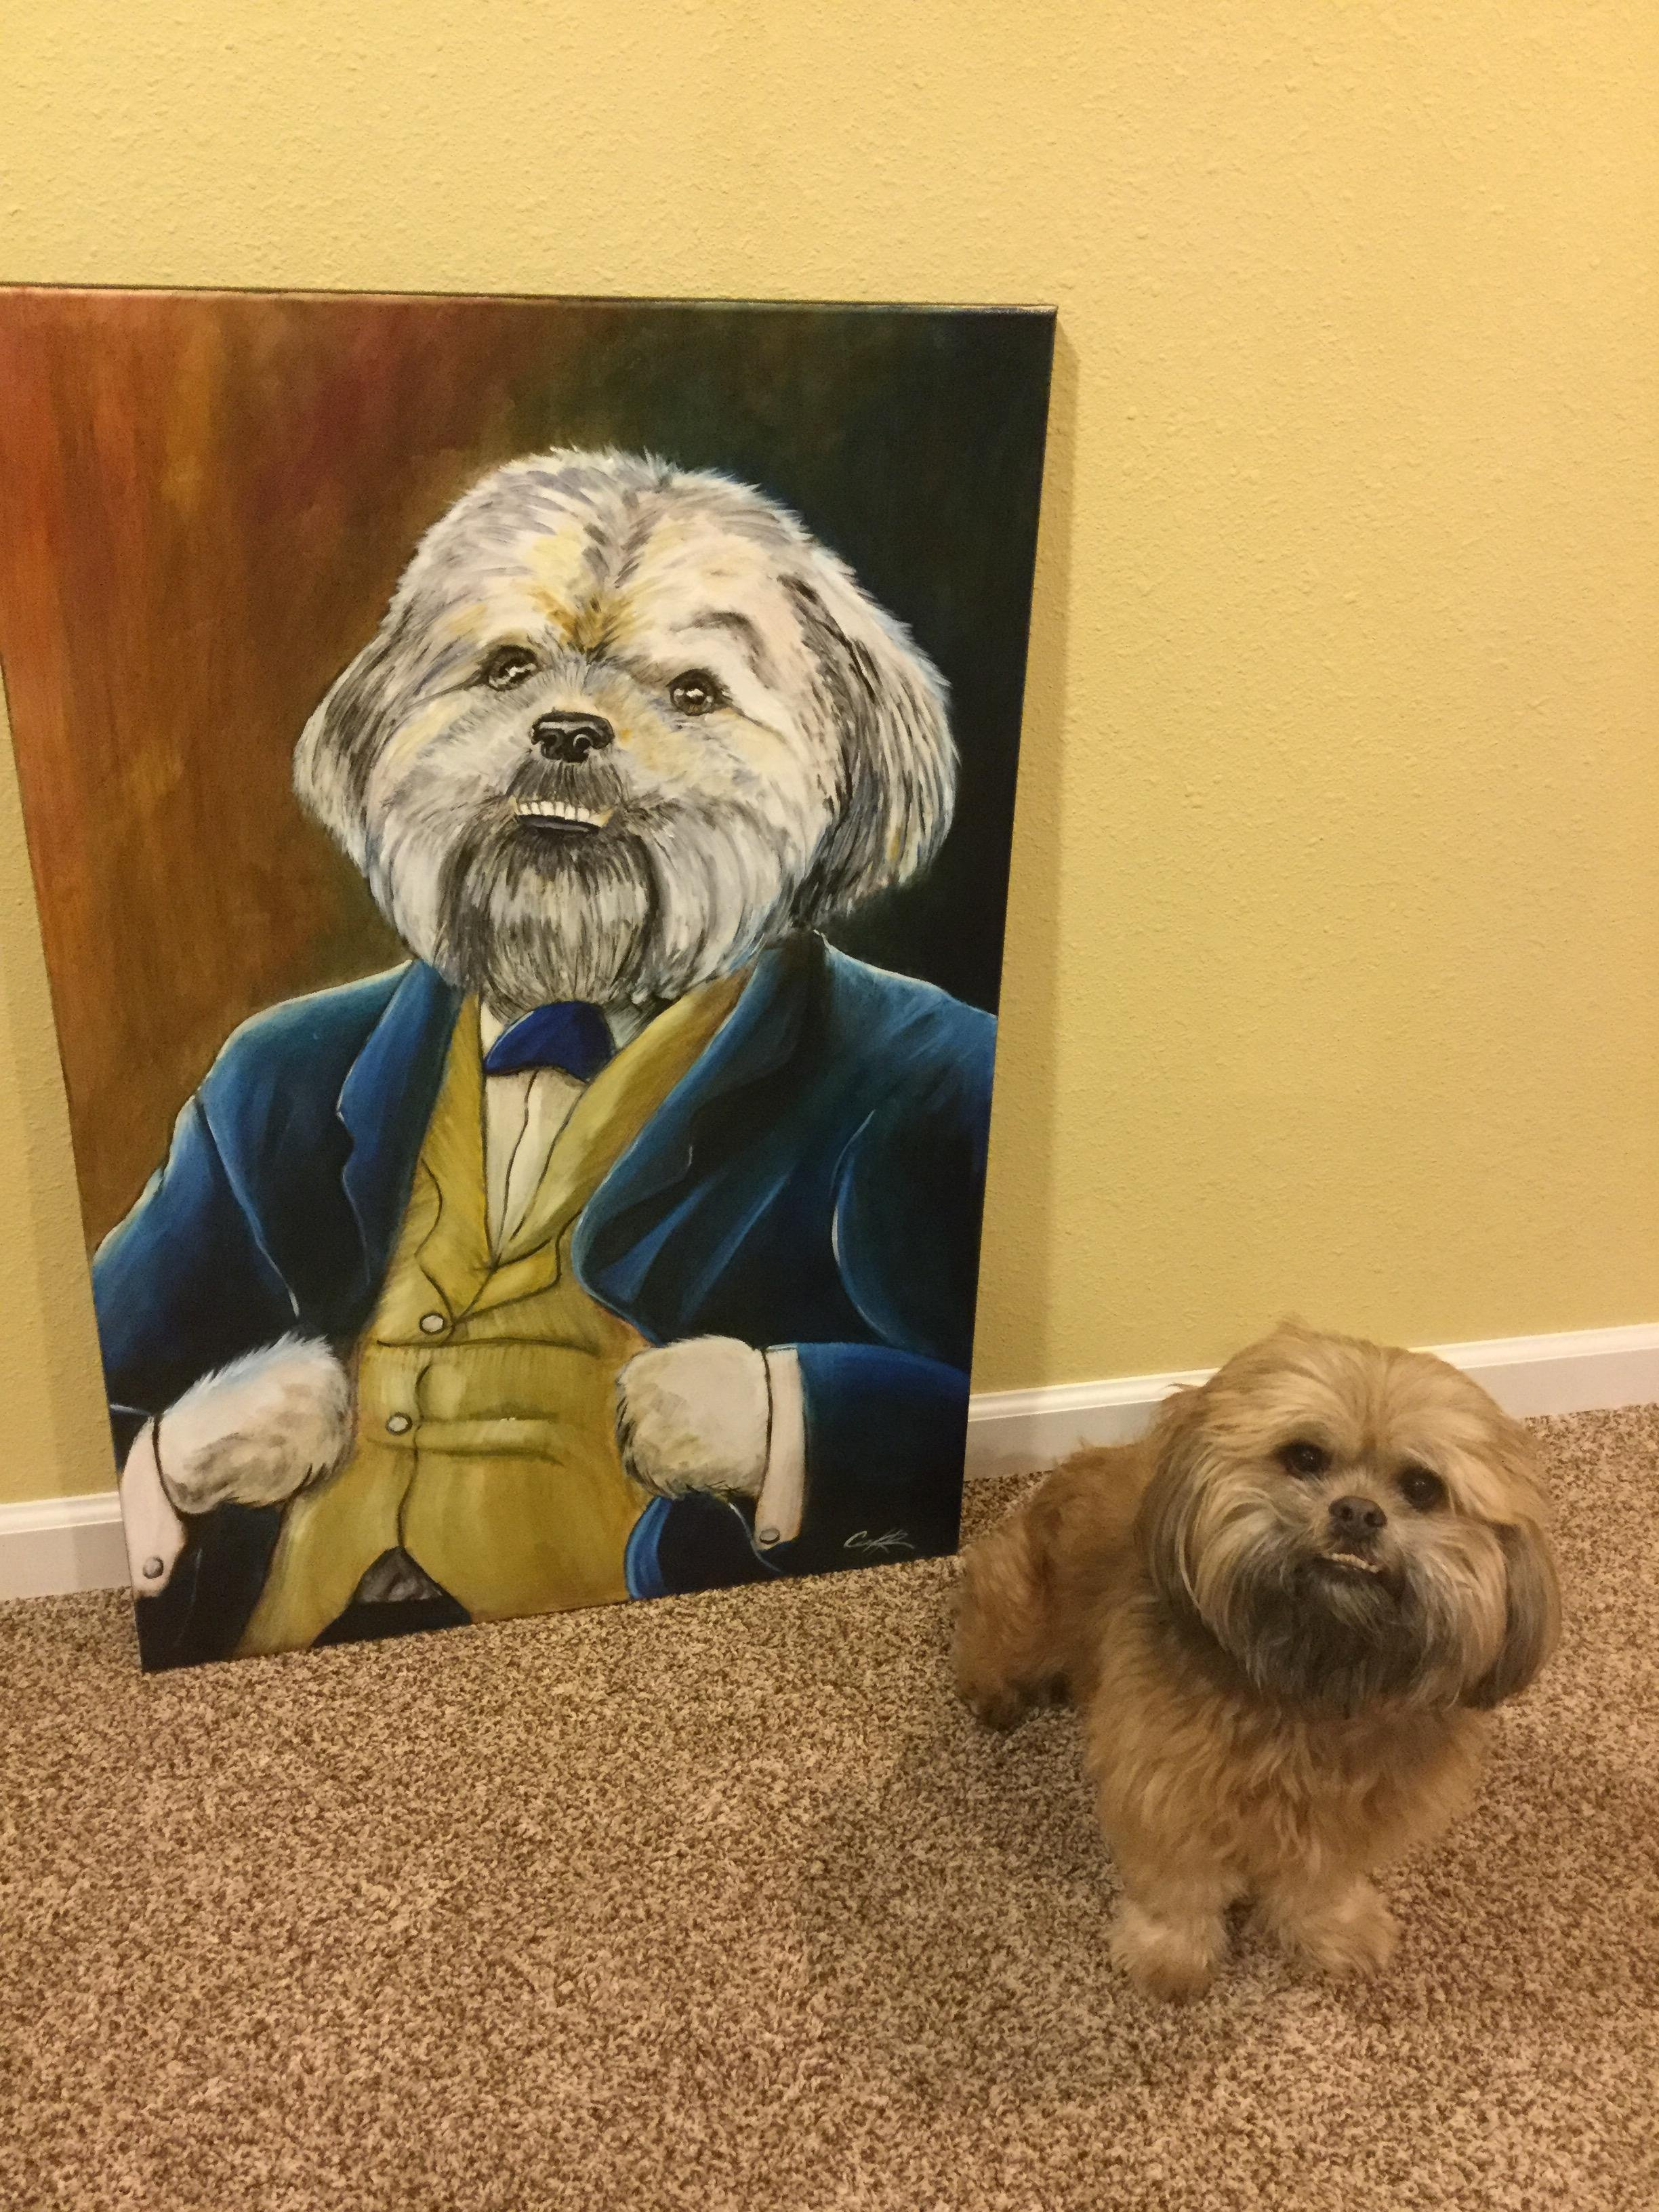 Custom painting of a dog